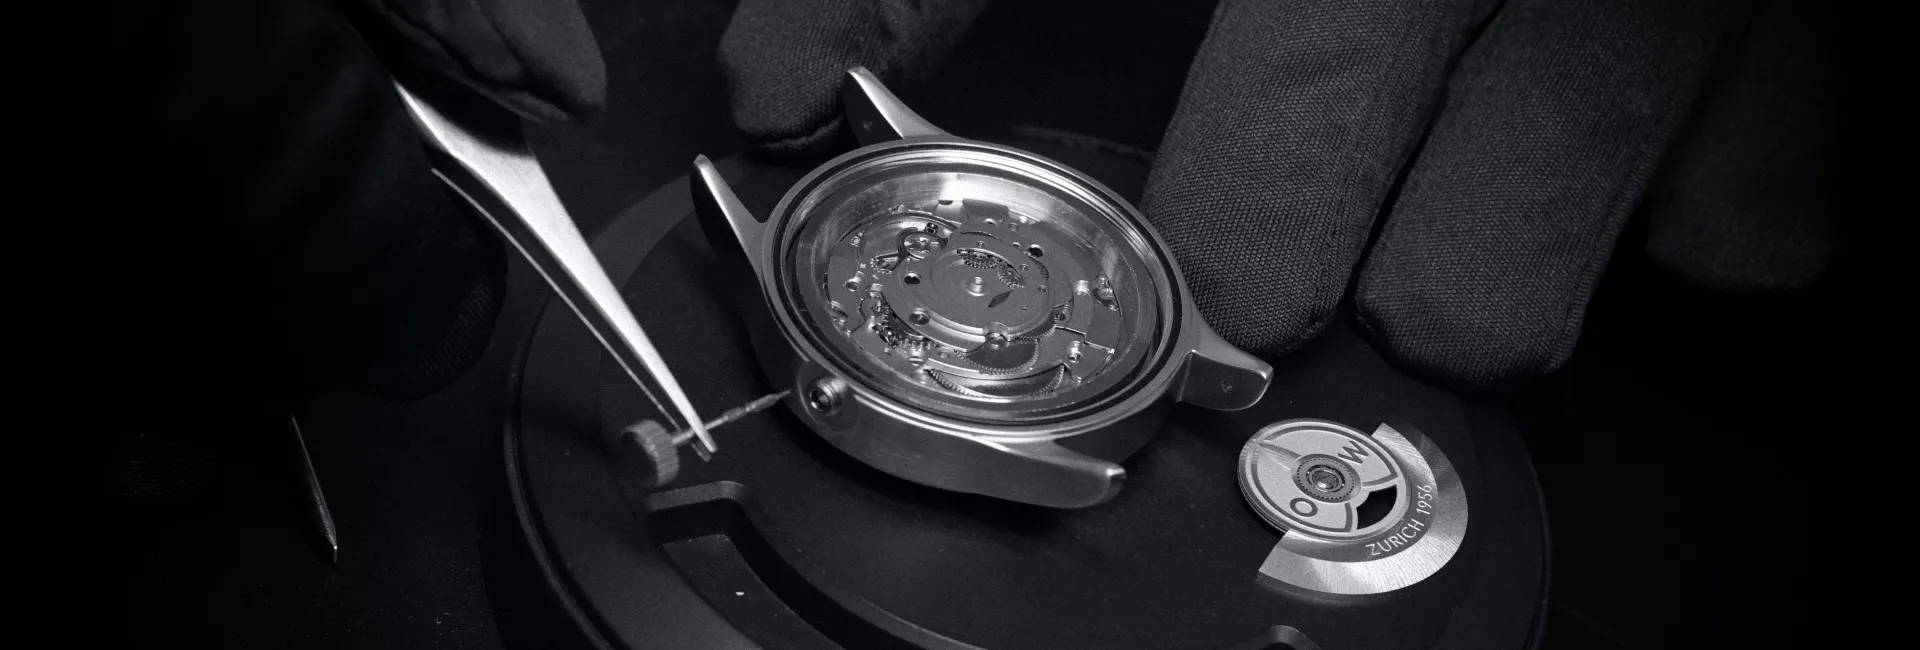 Ollech-and-Wajs-OW-Zurich-1956-Swiss watches